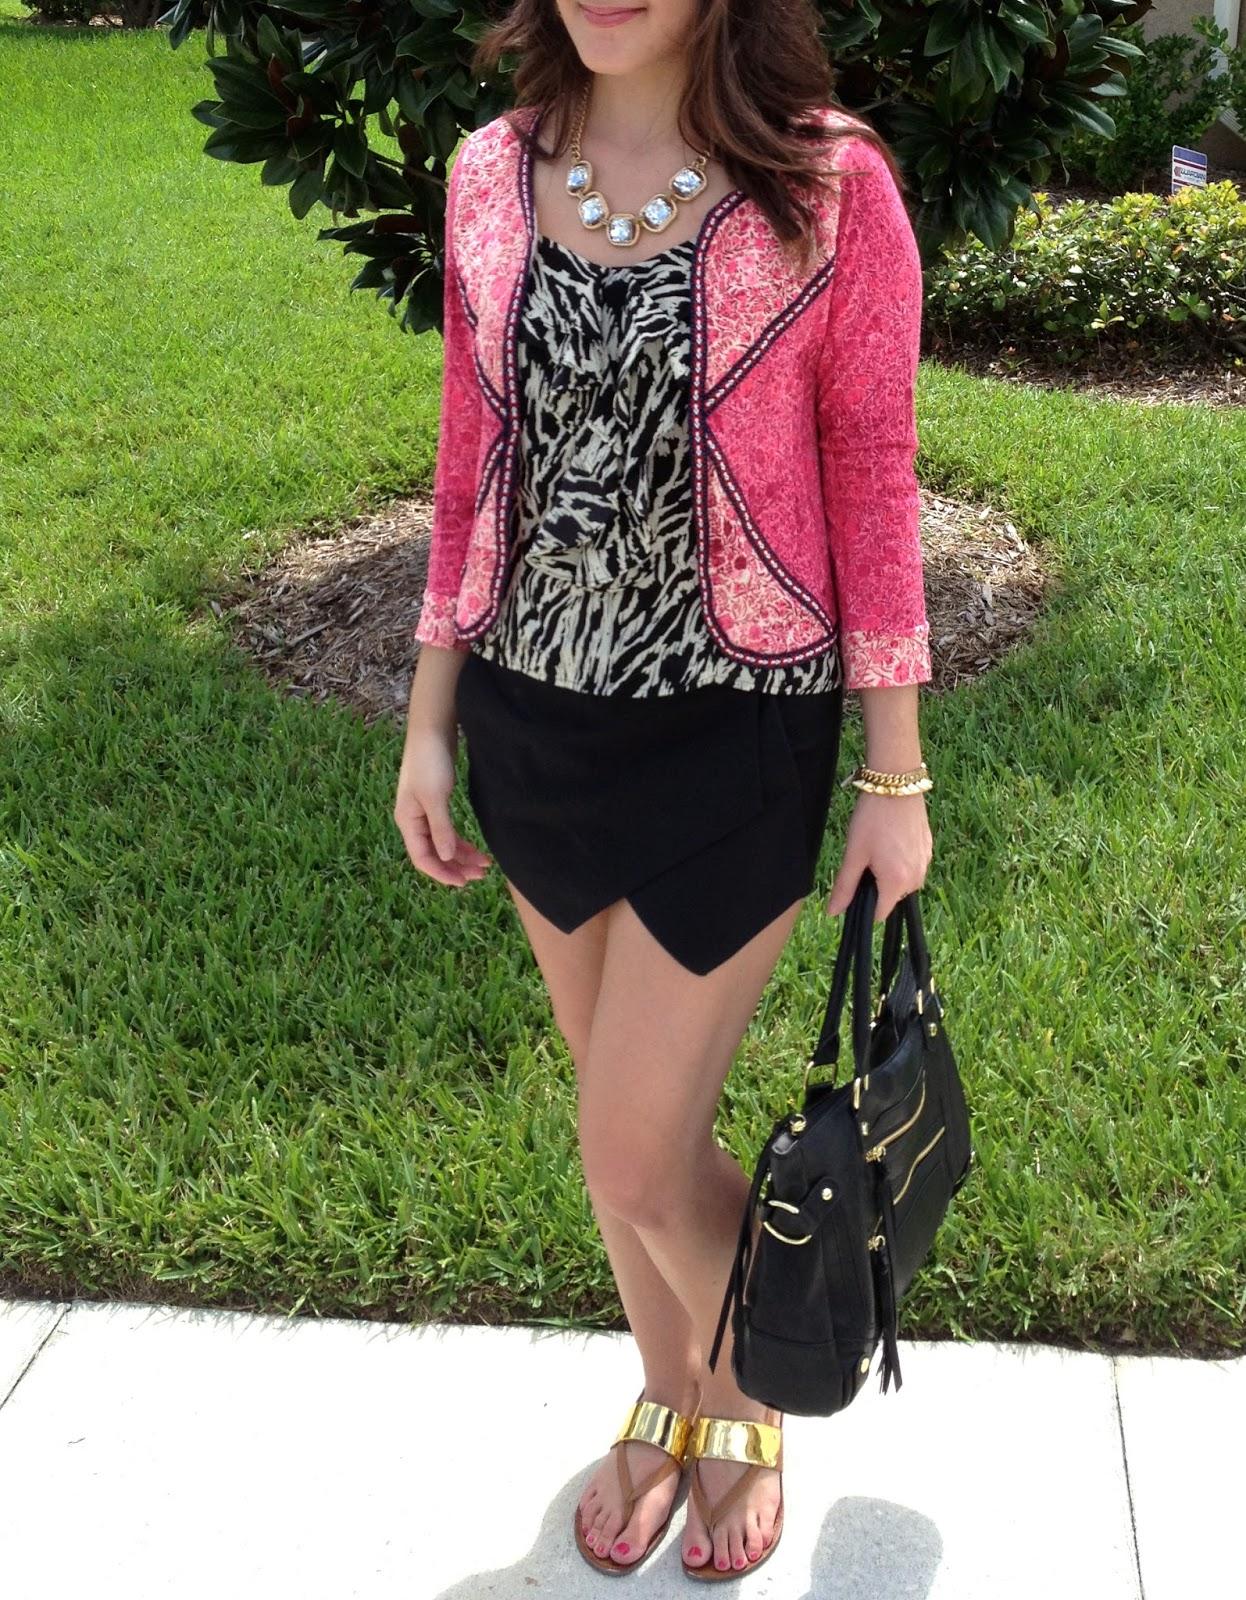 Fashion blog guest post 64